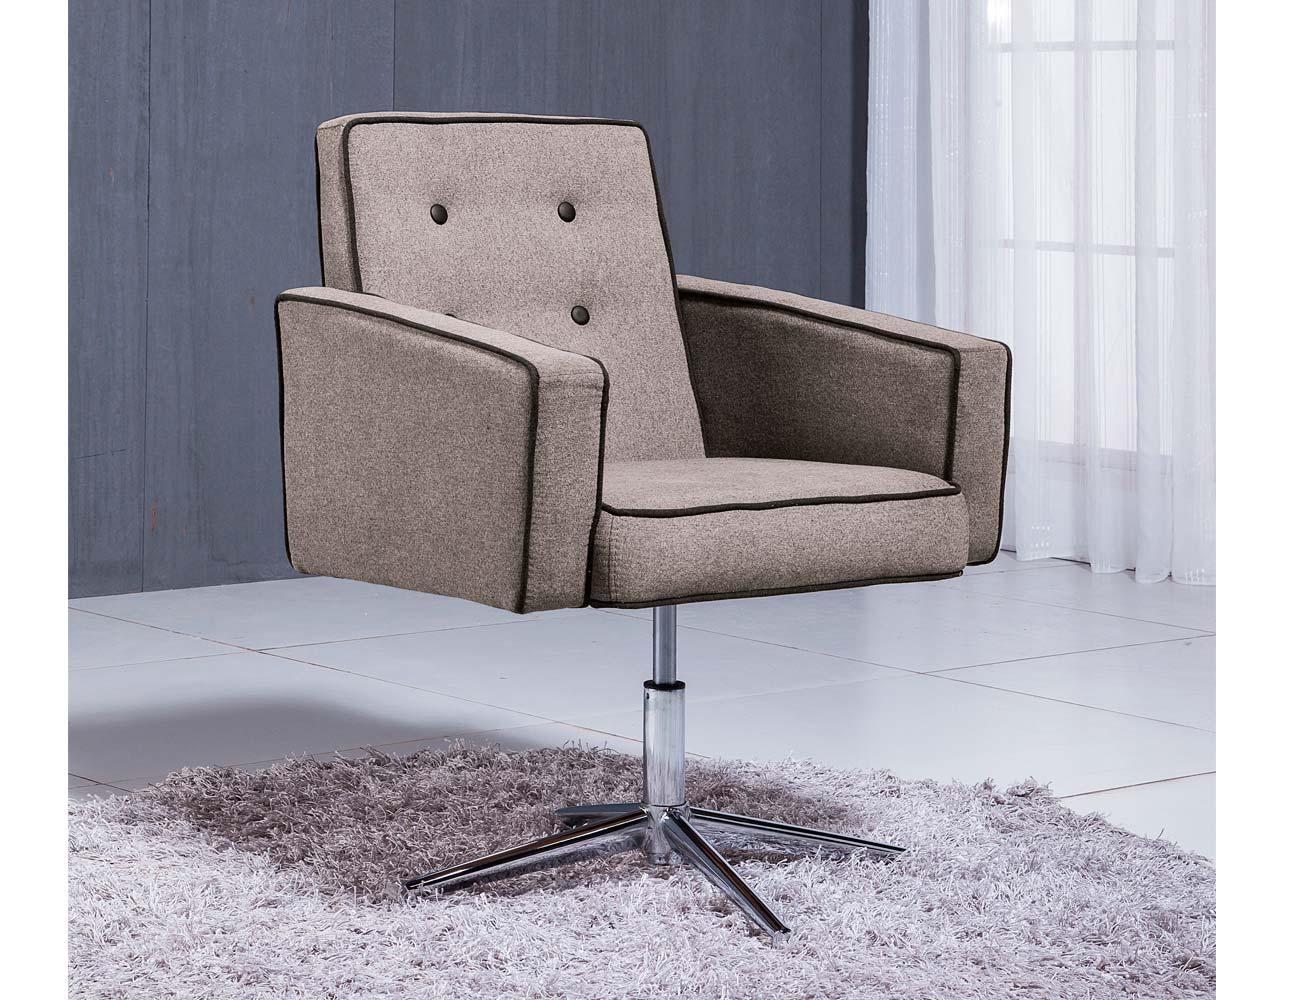 Tienda muebles moka obtenga ideas dise o de muebles para for Cama nido hipermueble